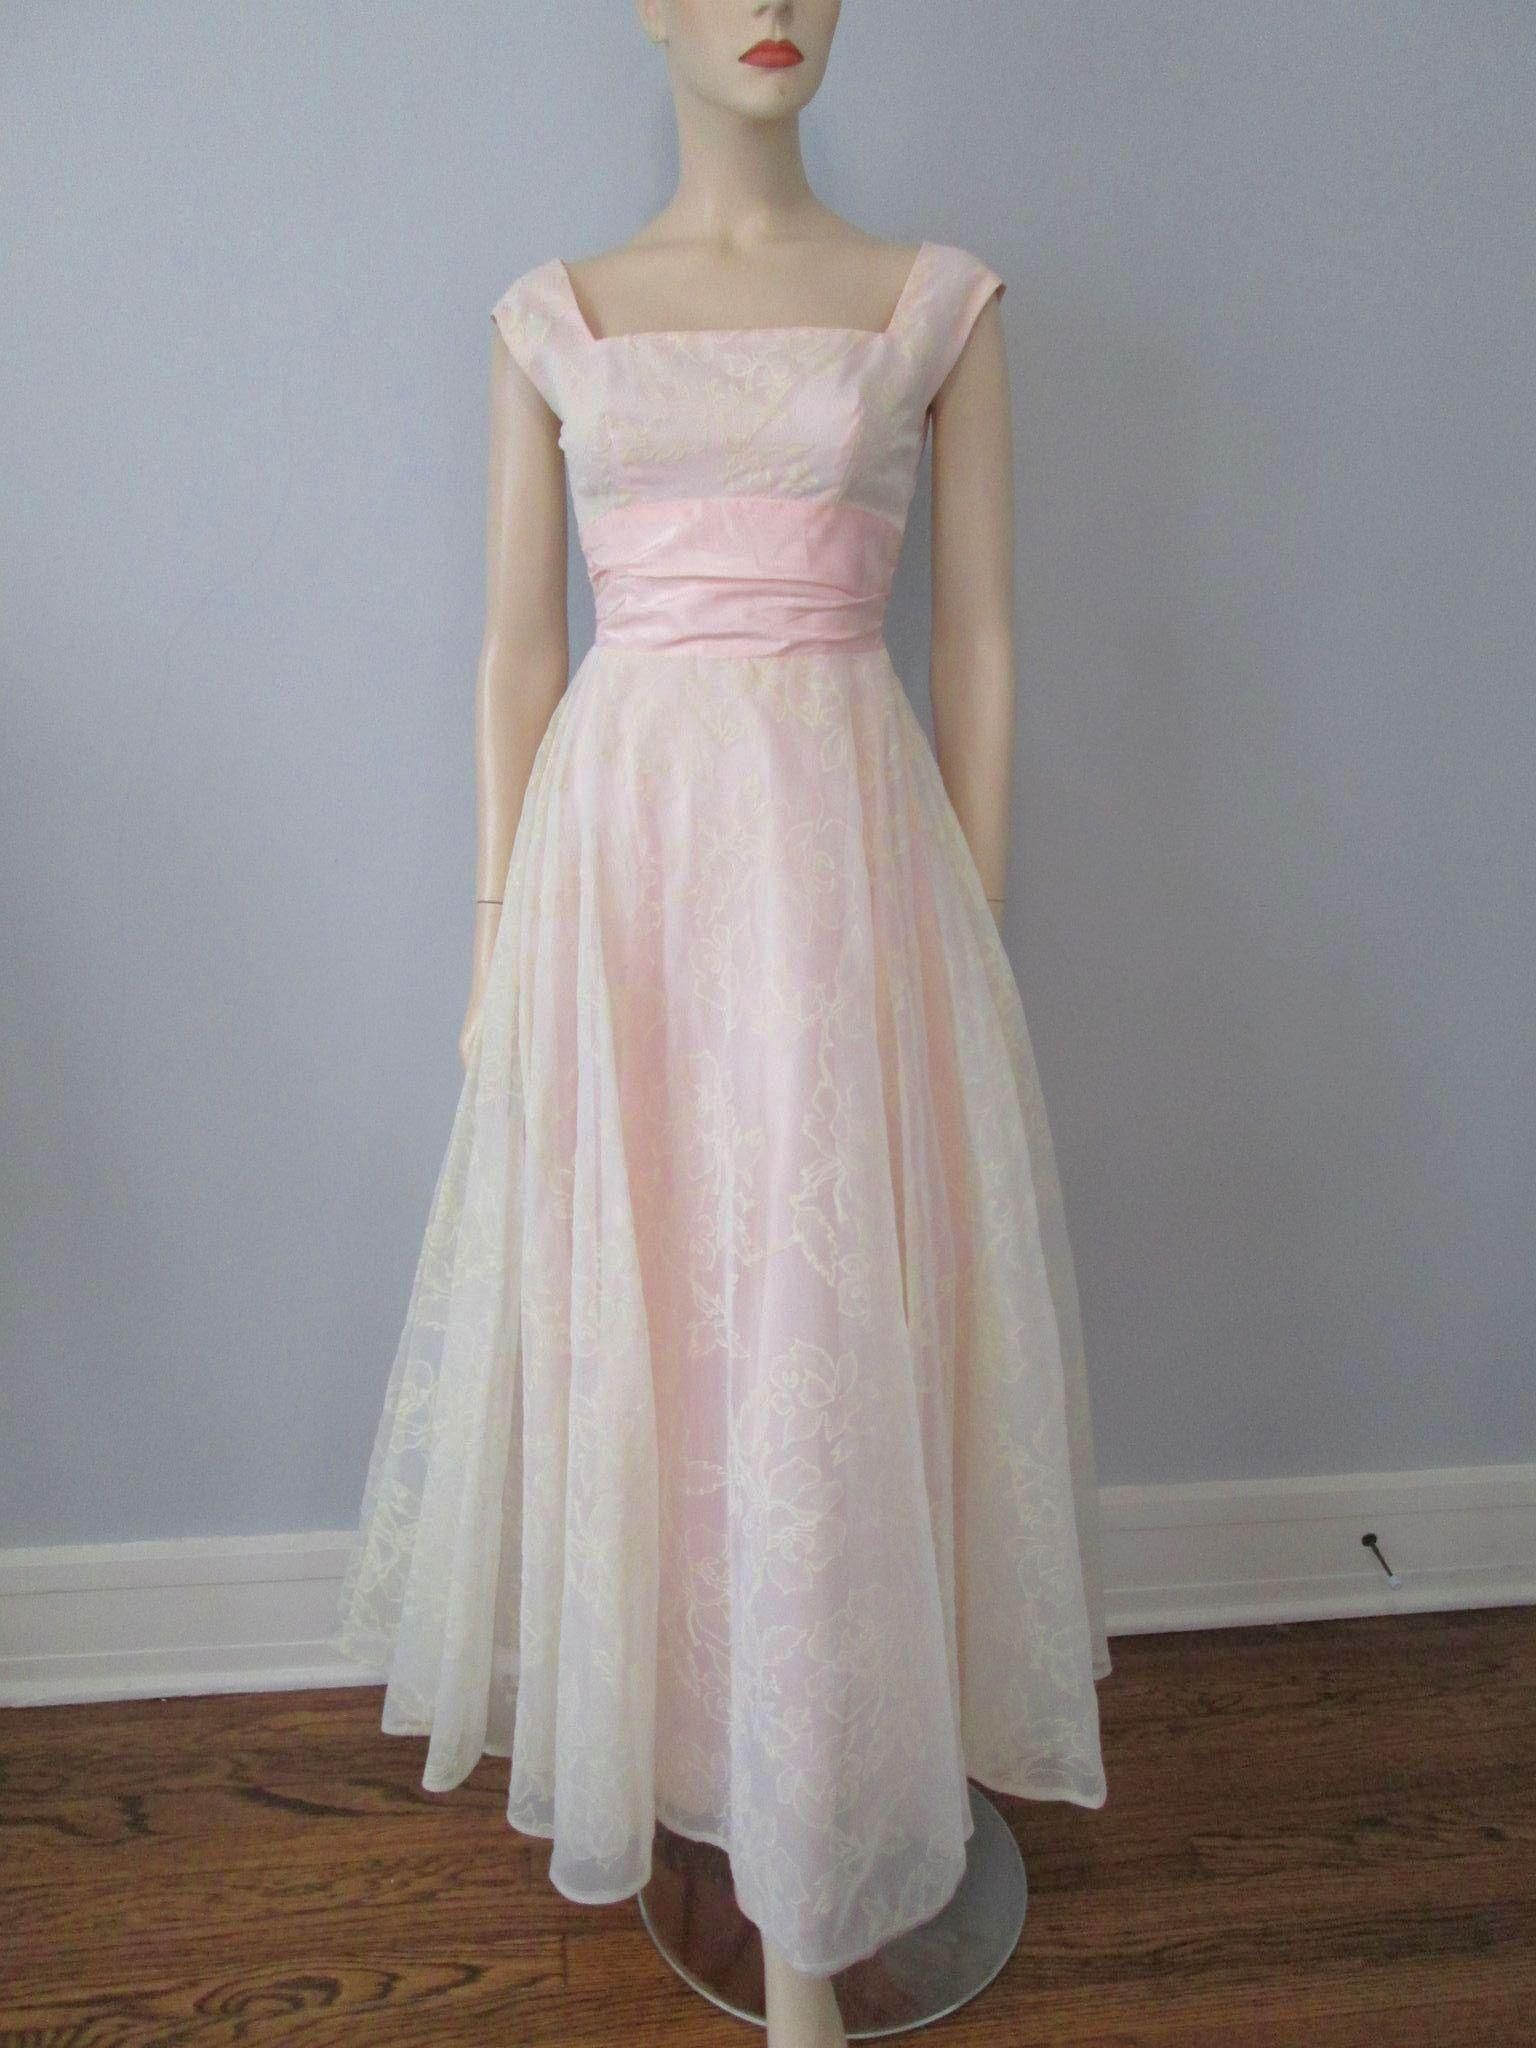 Vintage 1960s Prom Dress Formal Gown Floral Pink Satin Maxi Sleeveless Evening Dresses Elegant Unique Prom Dresses Prom Dresses Vintage [ 2048 x 1536 Pixel ]